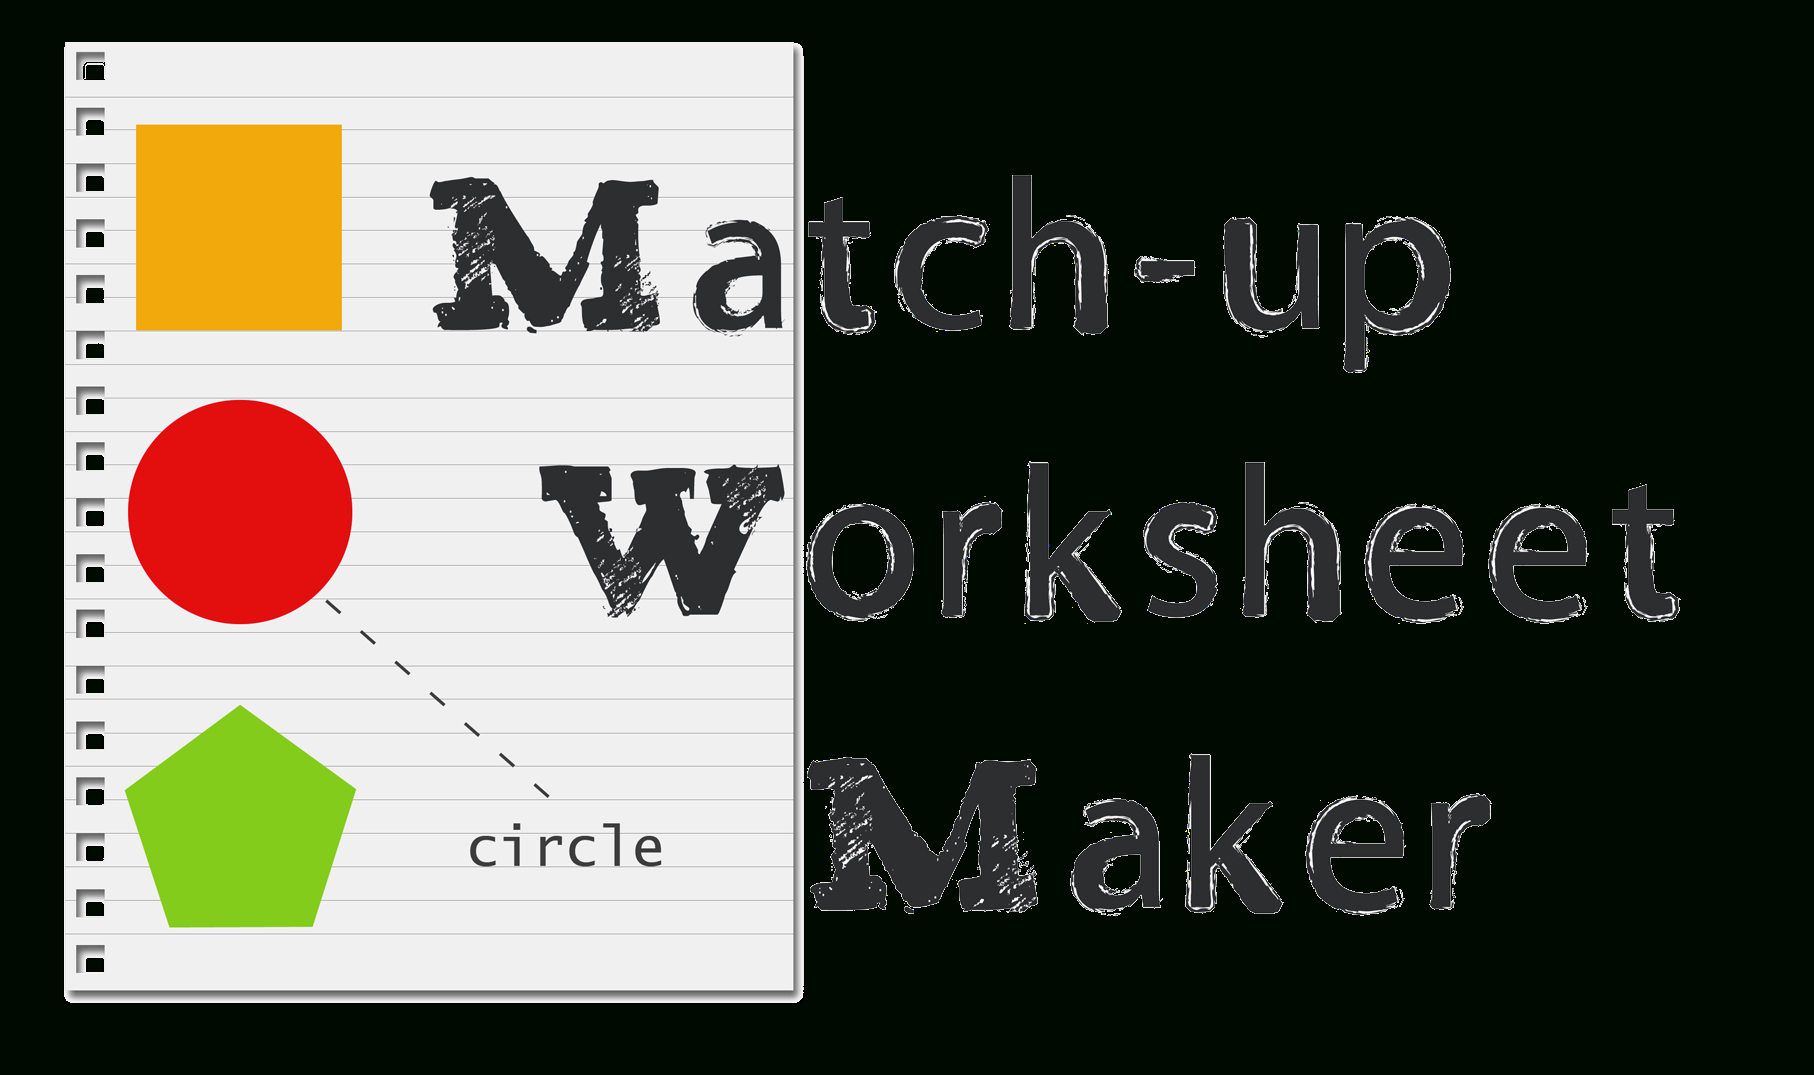 Matching Worksheet Maker: Create Custom Printable Worksheets - Make Your Own Worksheets Free Printable